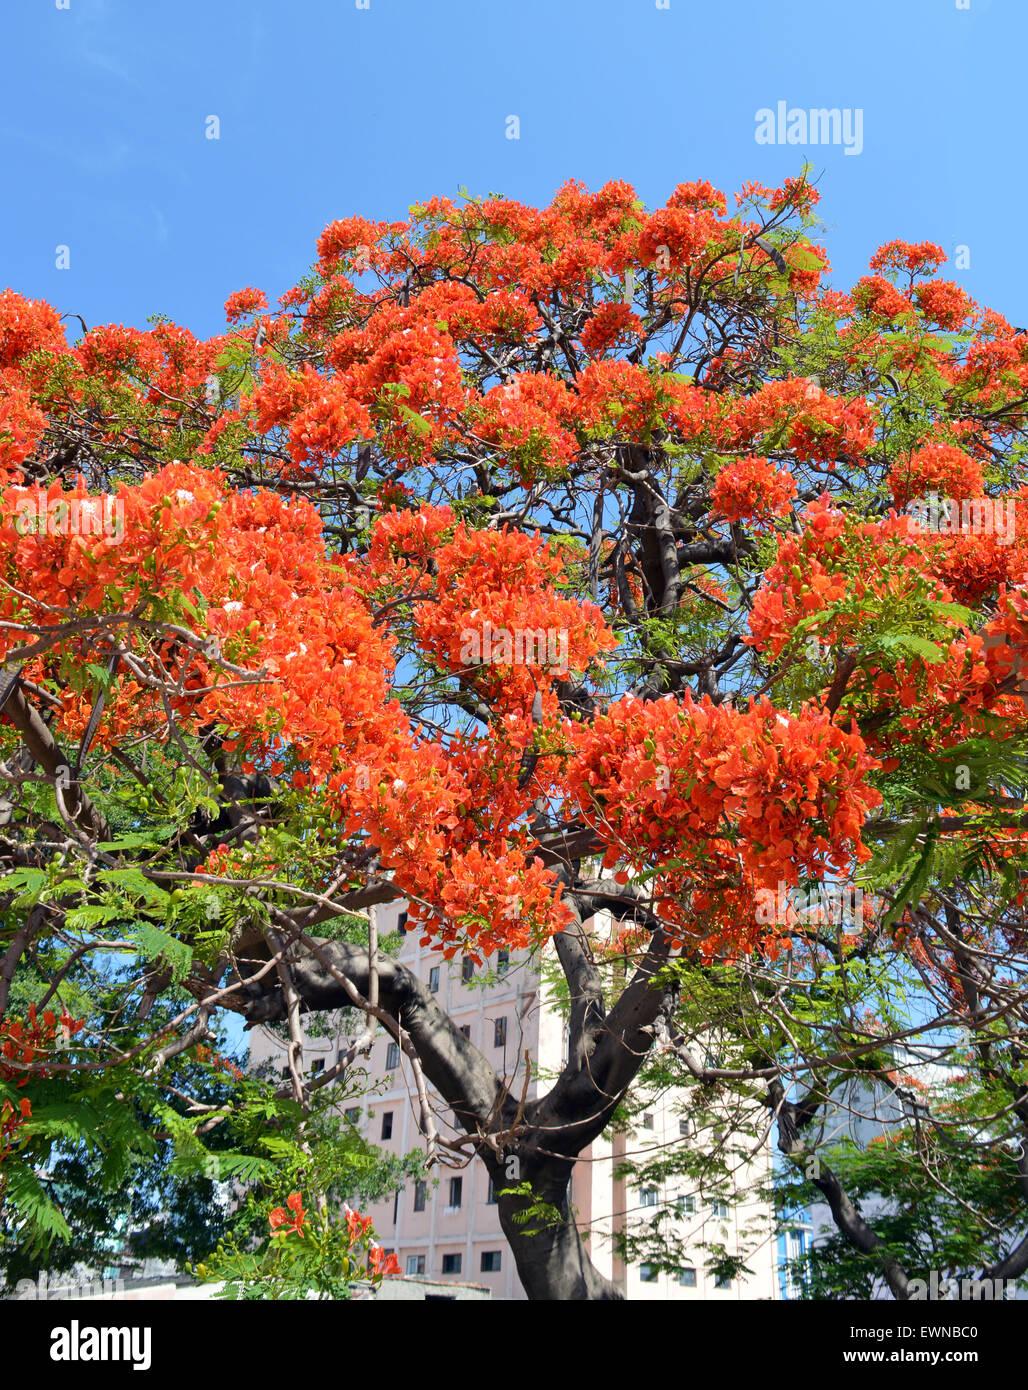 Havana, Cuba: Royal Poinciana Tree (Flamboyán) - Stock Image